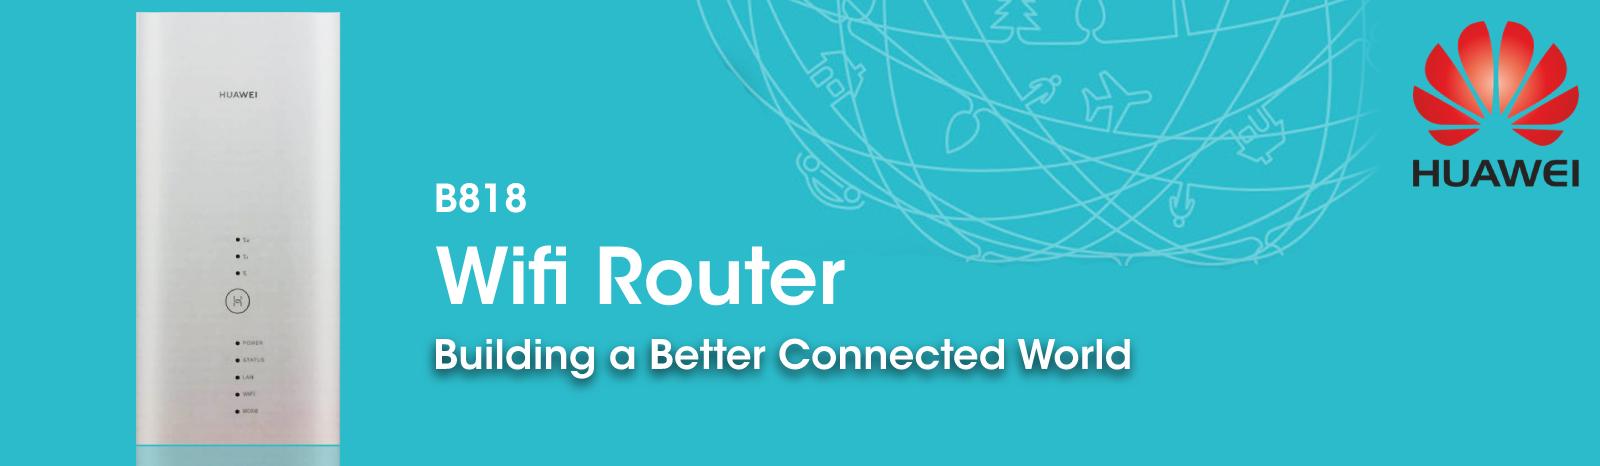 Huawei B818 CAT19 Gigabit LTE WiFi Router | Buy Online